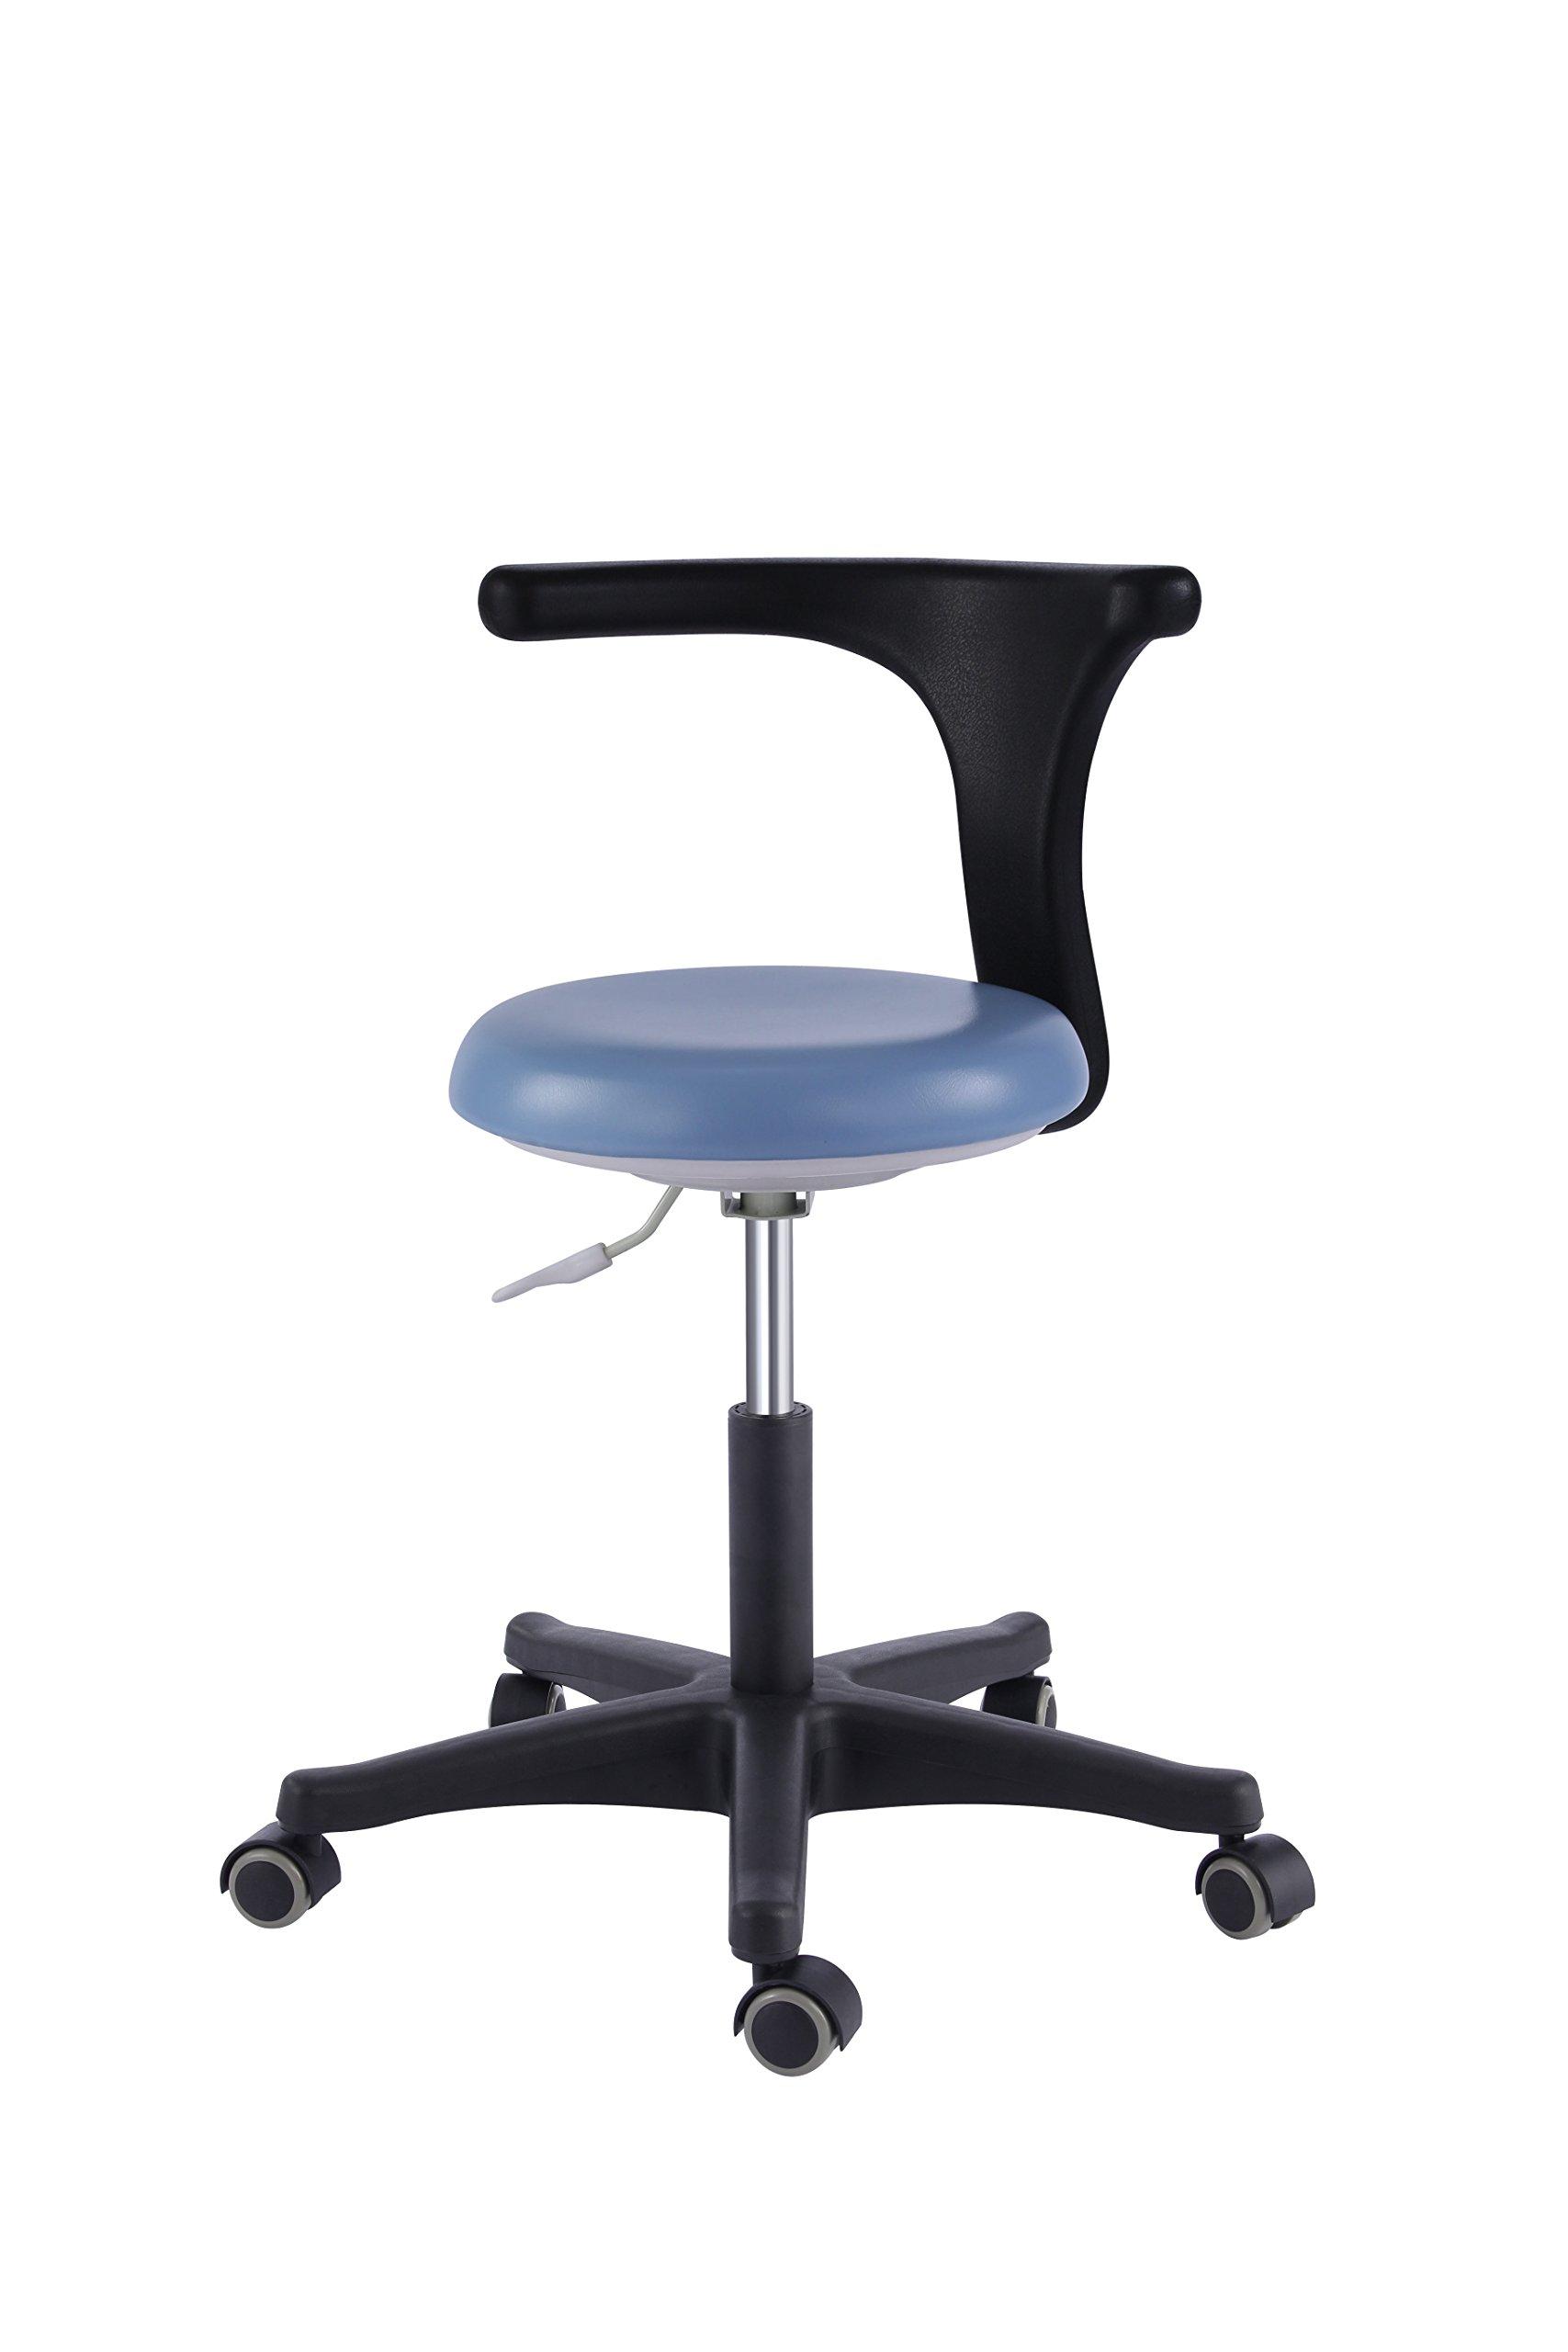 Zeta Dental Office Stools Assistant's Stools Medical Adjustable Mobile Chair PU Black (14#) by Zeta